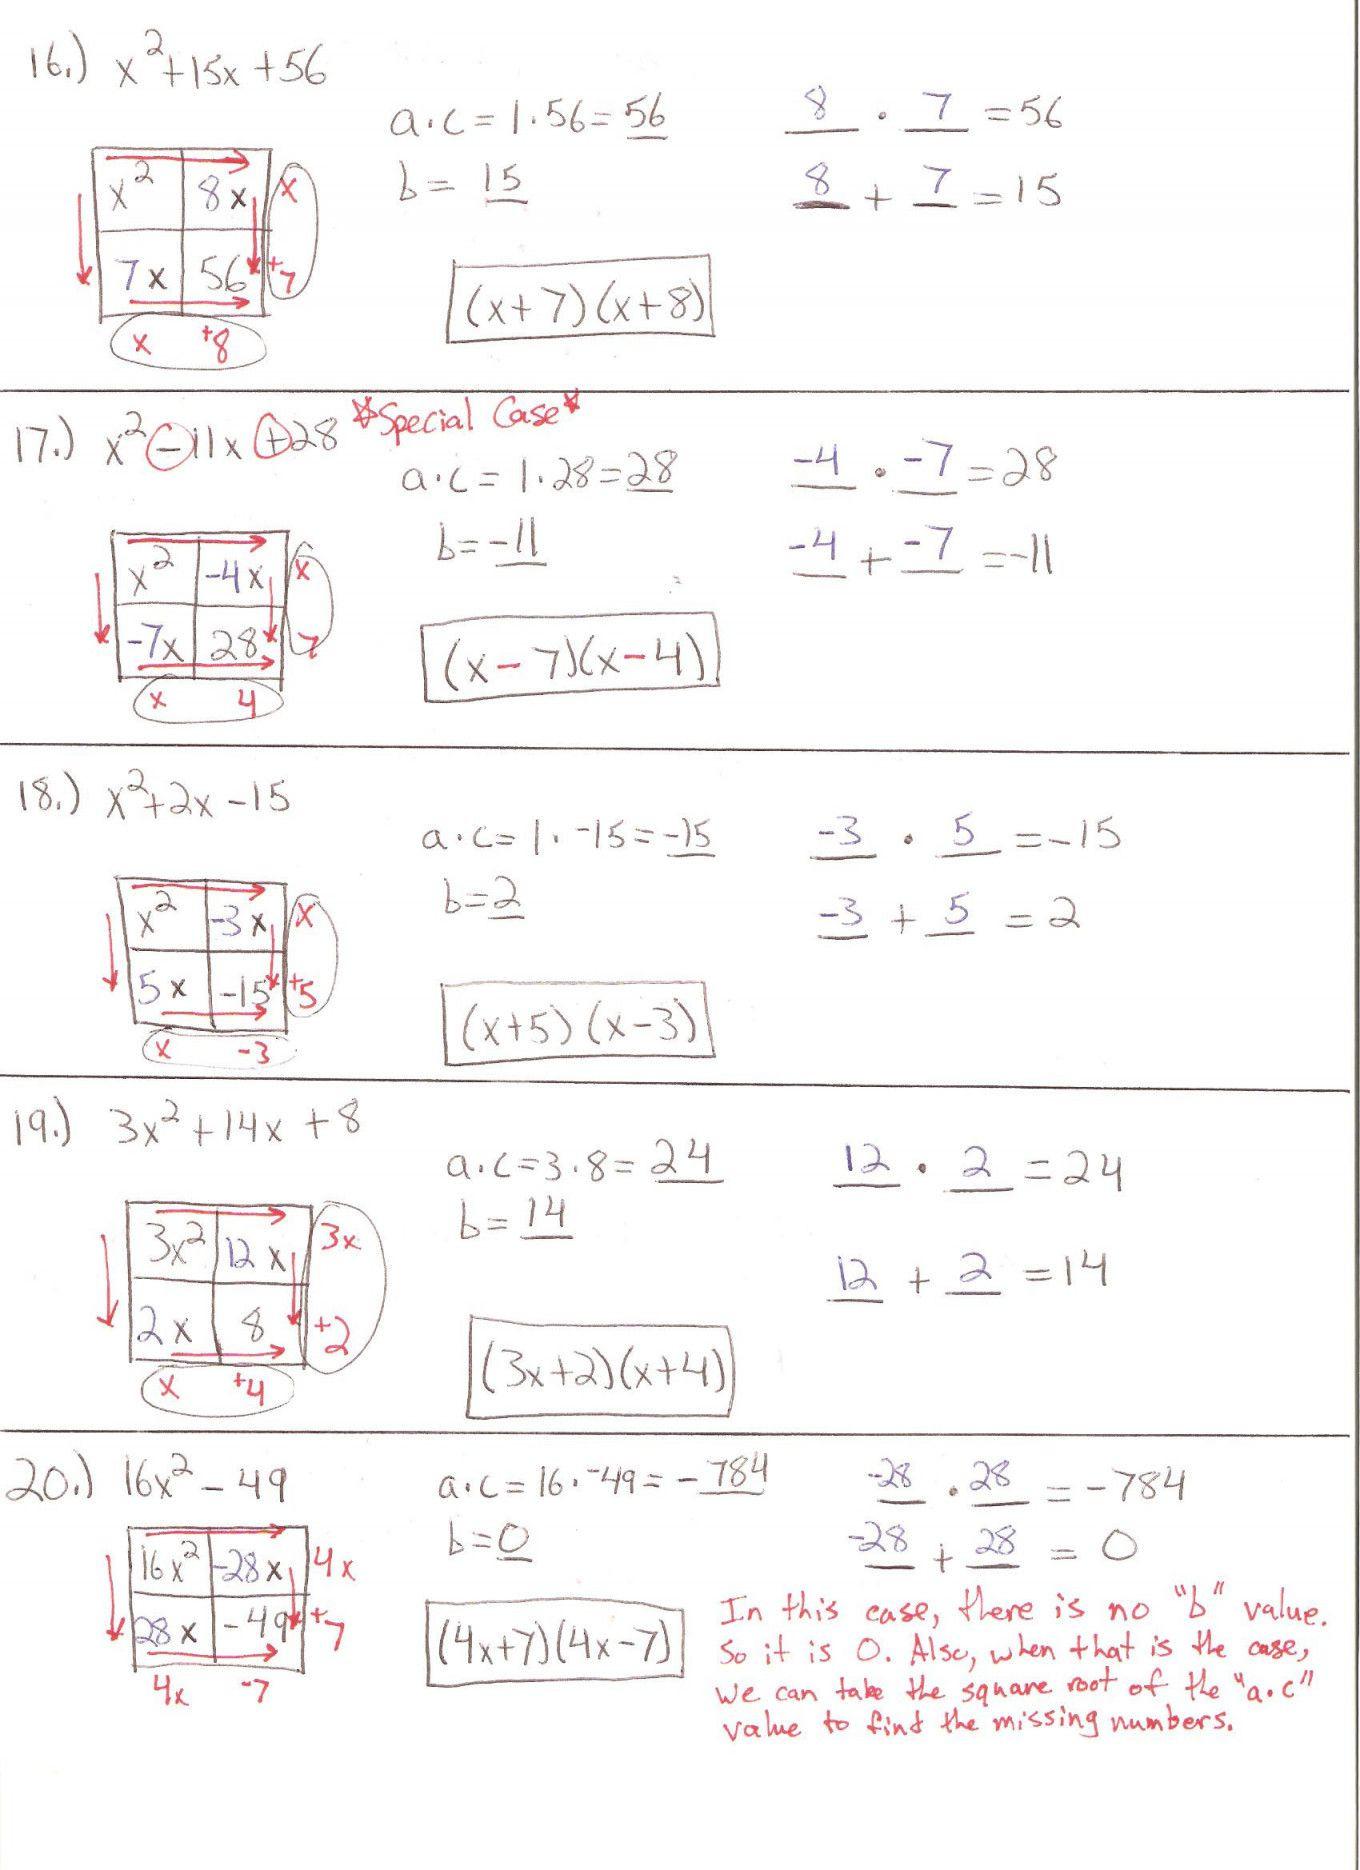 Factoring Trinomials Worksheet Algebra 2 Factoring Polynomials Worksheet Maze